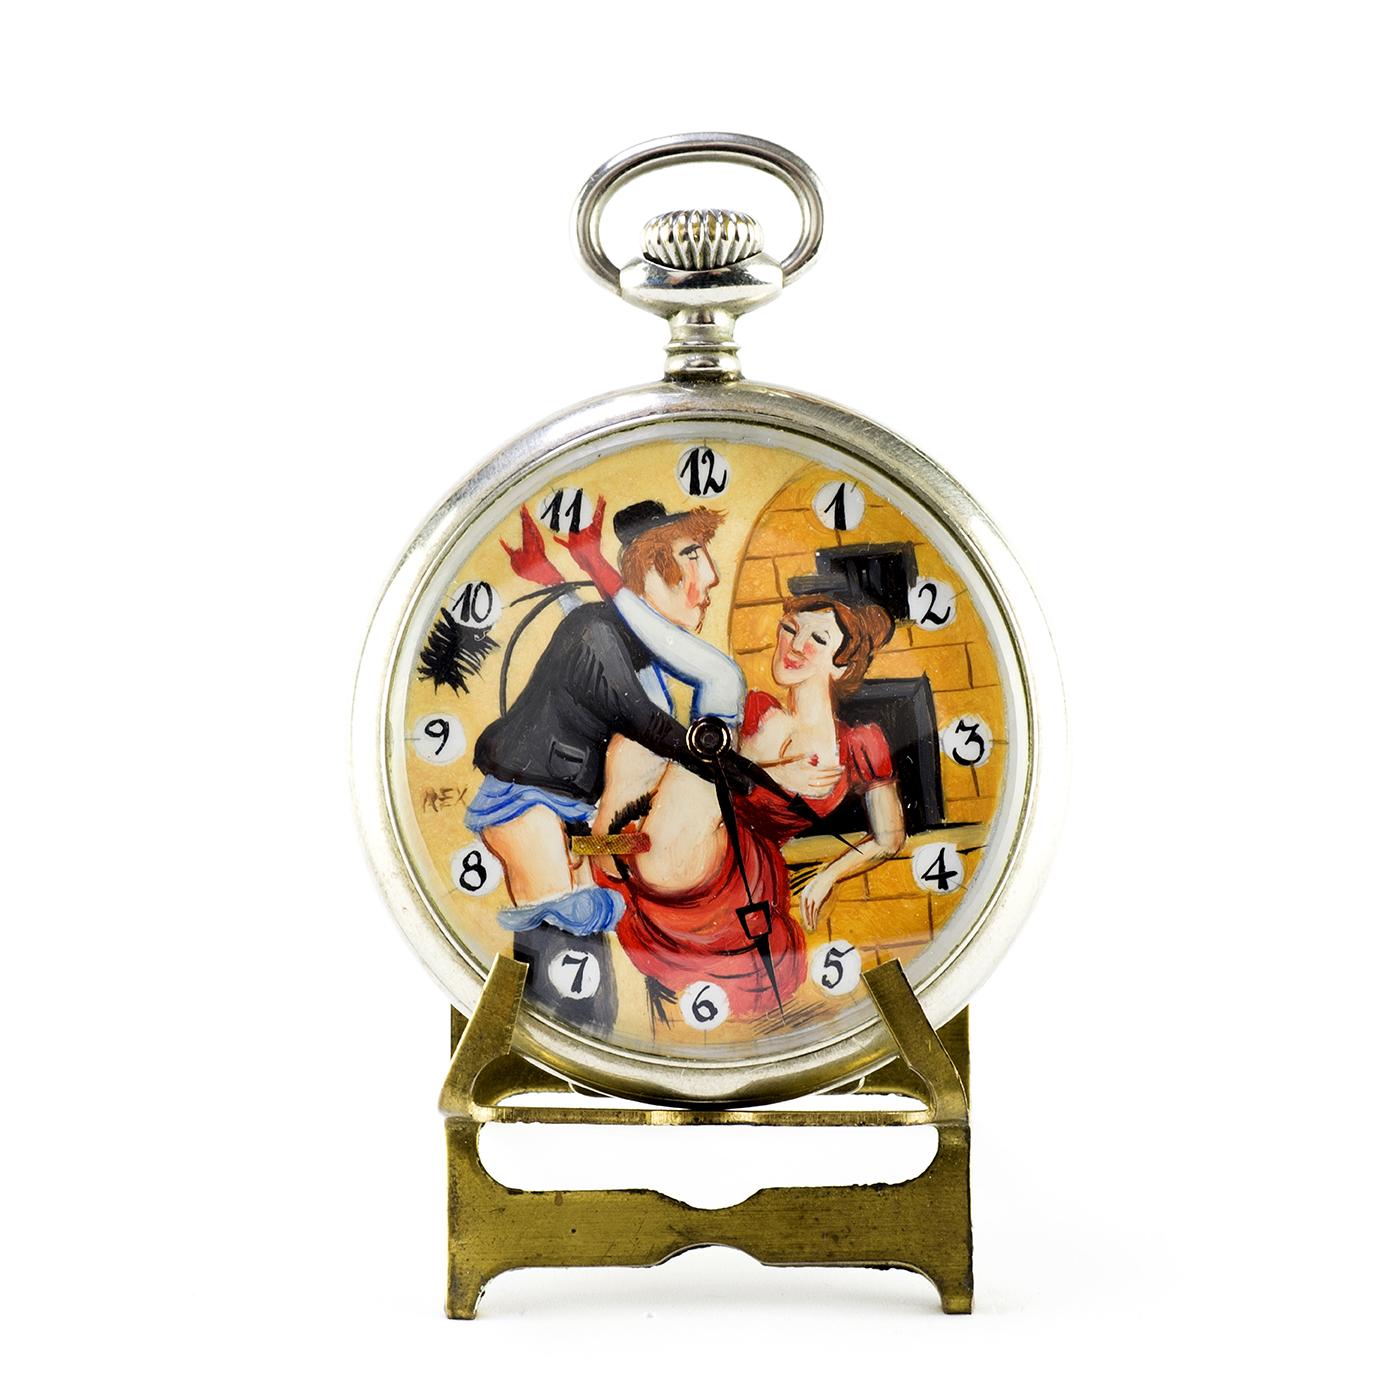 MAESTRÍA. Reloj Erótico de Bolsillo, Lepine, remontoir, Automatón. Ca. 1900